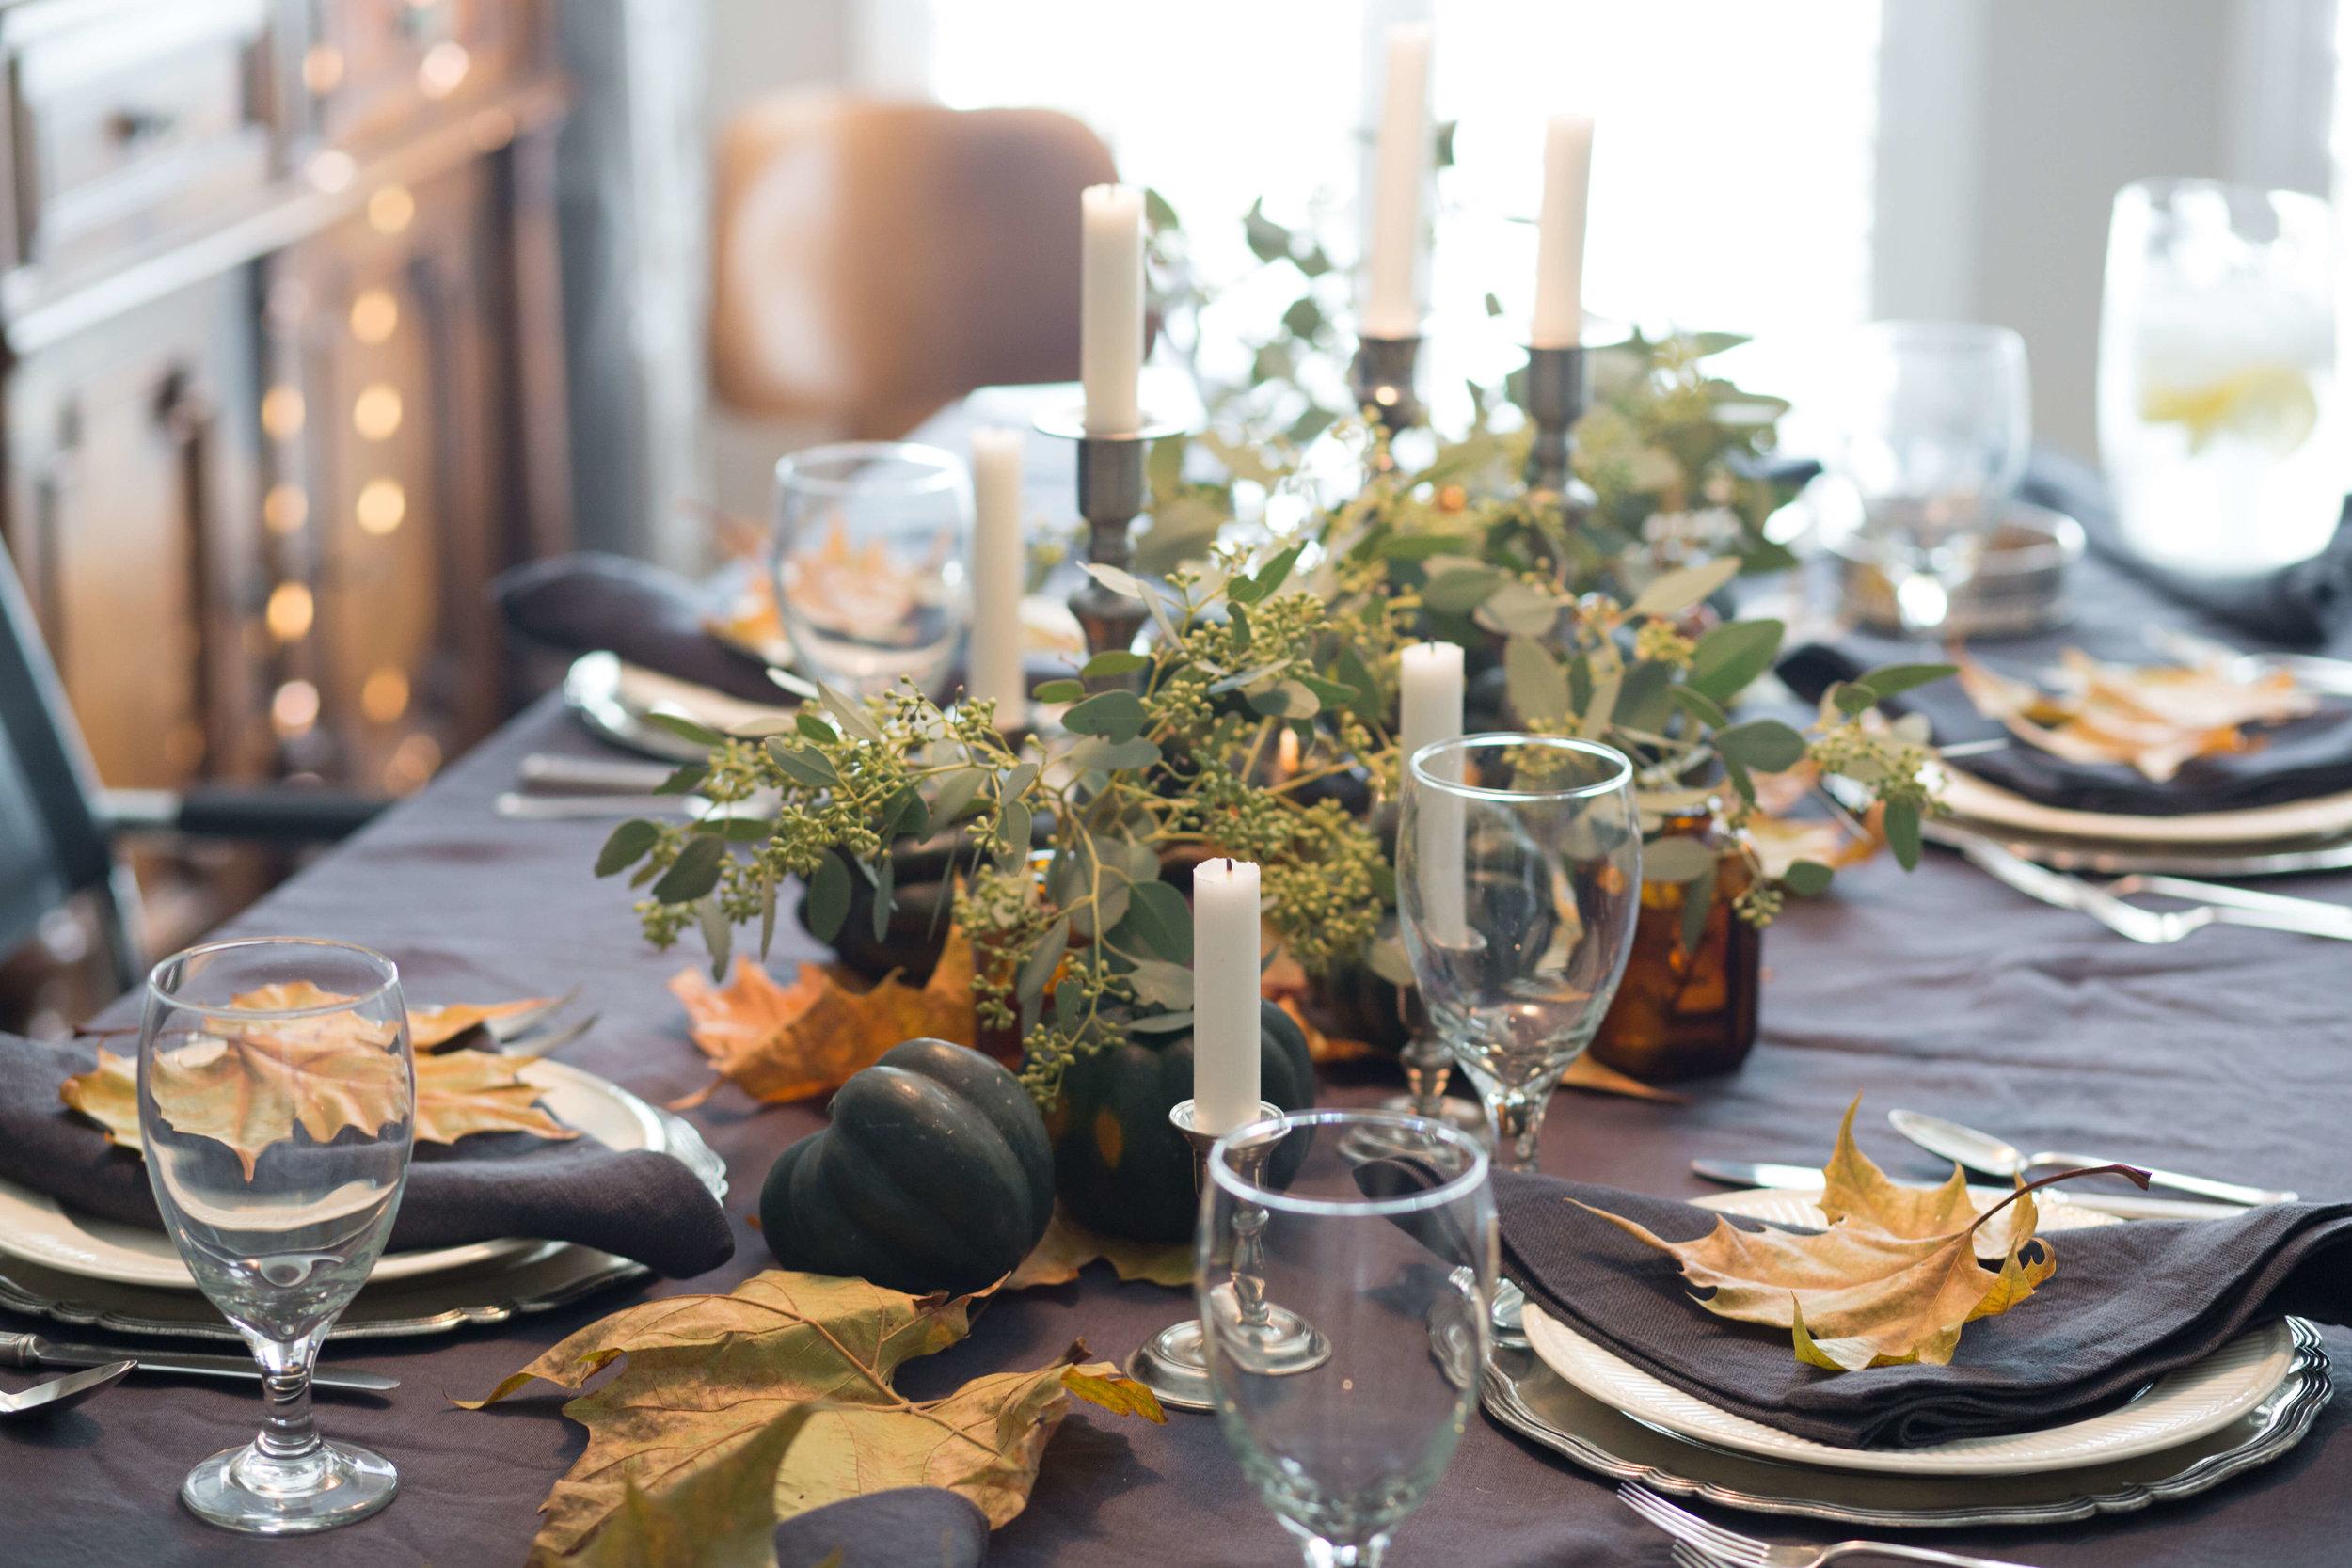 Fall tabletop with trending taper candles | Carla Aston Interior Designer, Tori Aston Photographer #tapercandles #candlesticks #interiordesigntrends #trending